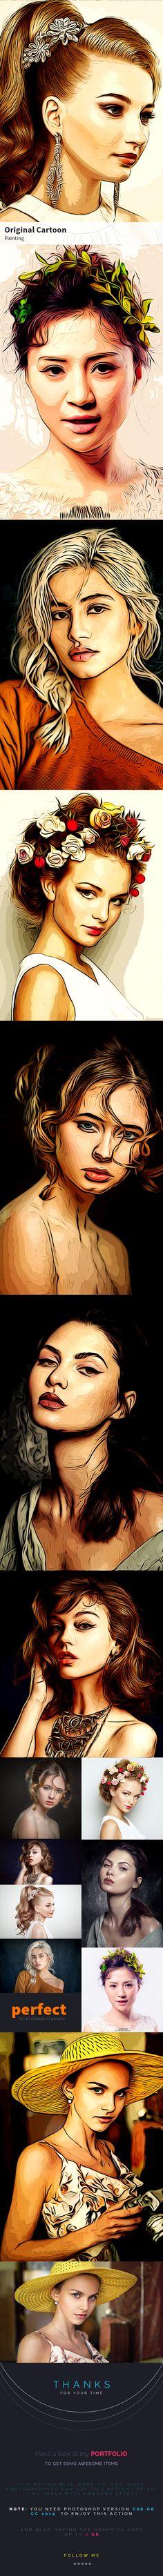 Original Cartoon Painting — Photoshop ATN #b&w #portrait watercolor • Available here → https://graphicriver.net/item/original-cartoon-painting/19919273?ref=pxcr